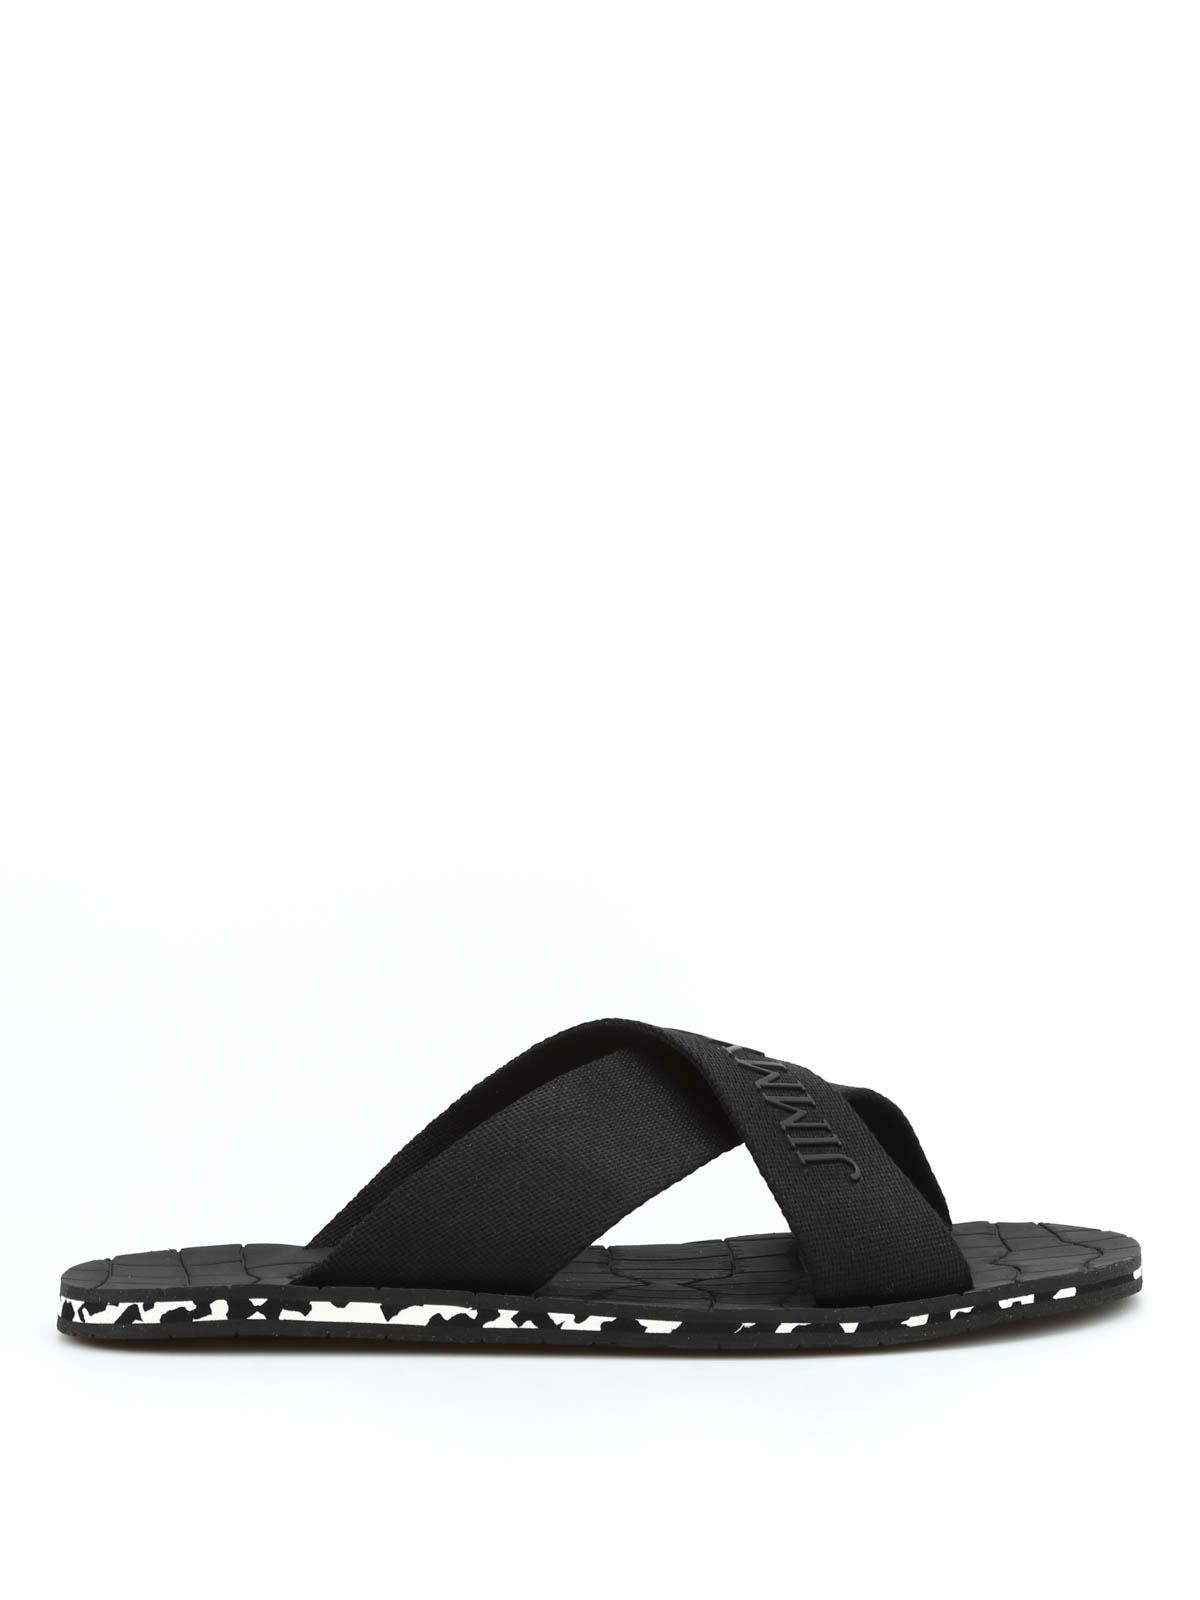 0e0576cf2c79 Jimmy Choo - Clive grosgrain sandals - sandals - CLIVE GGU BLACK